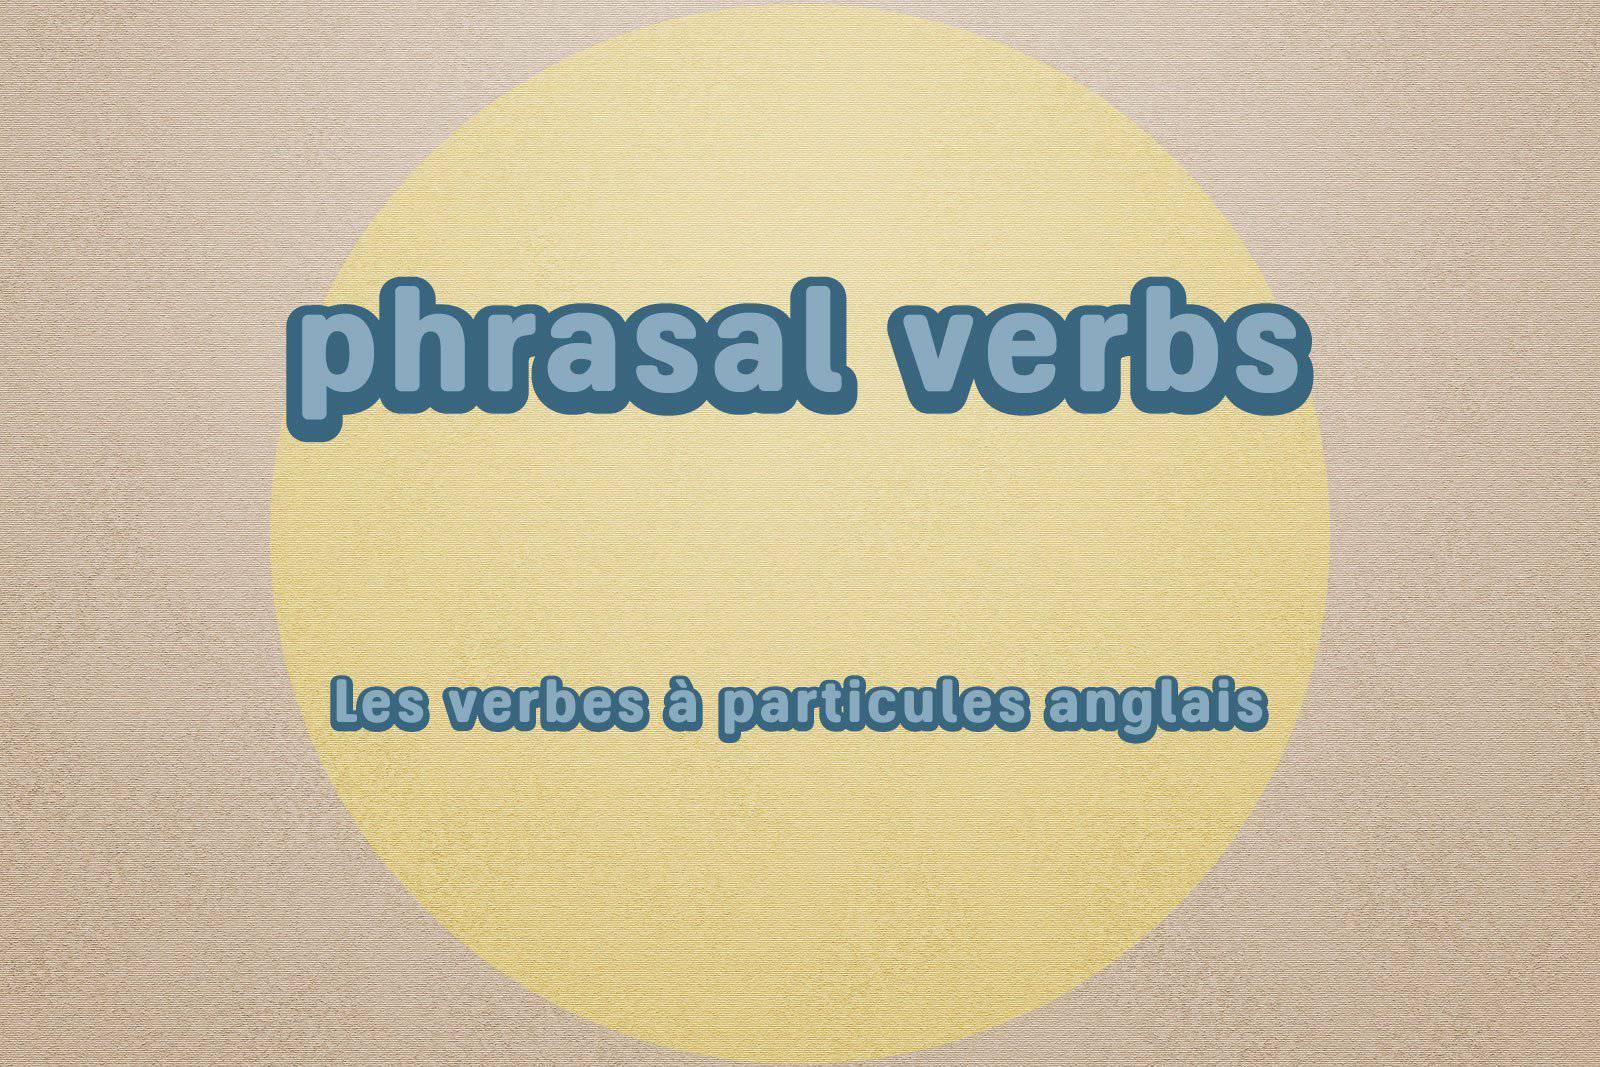 Phrasal verbs (verbes à particules anglais)